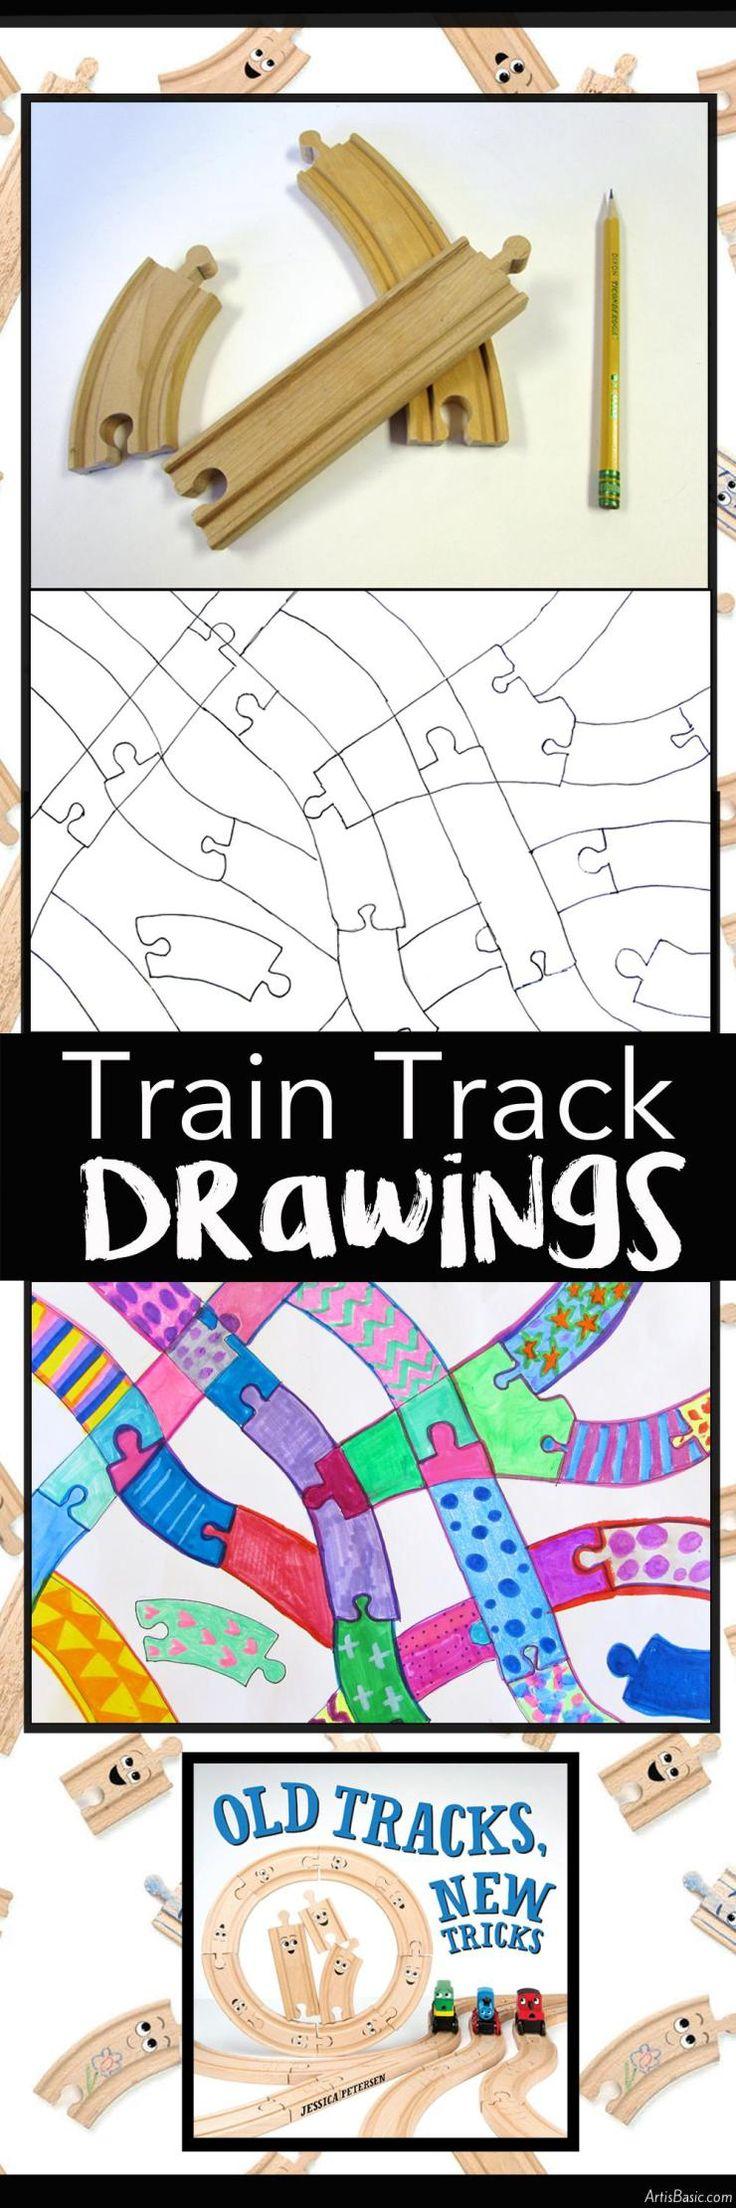 Train Track Drawings